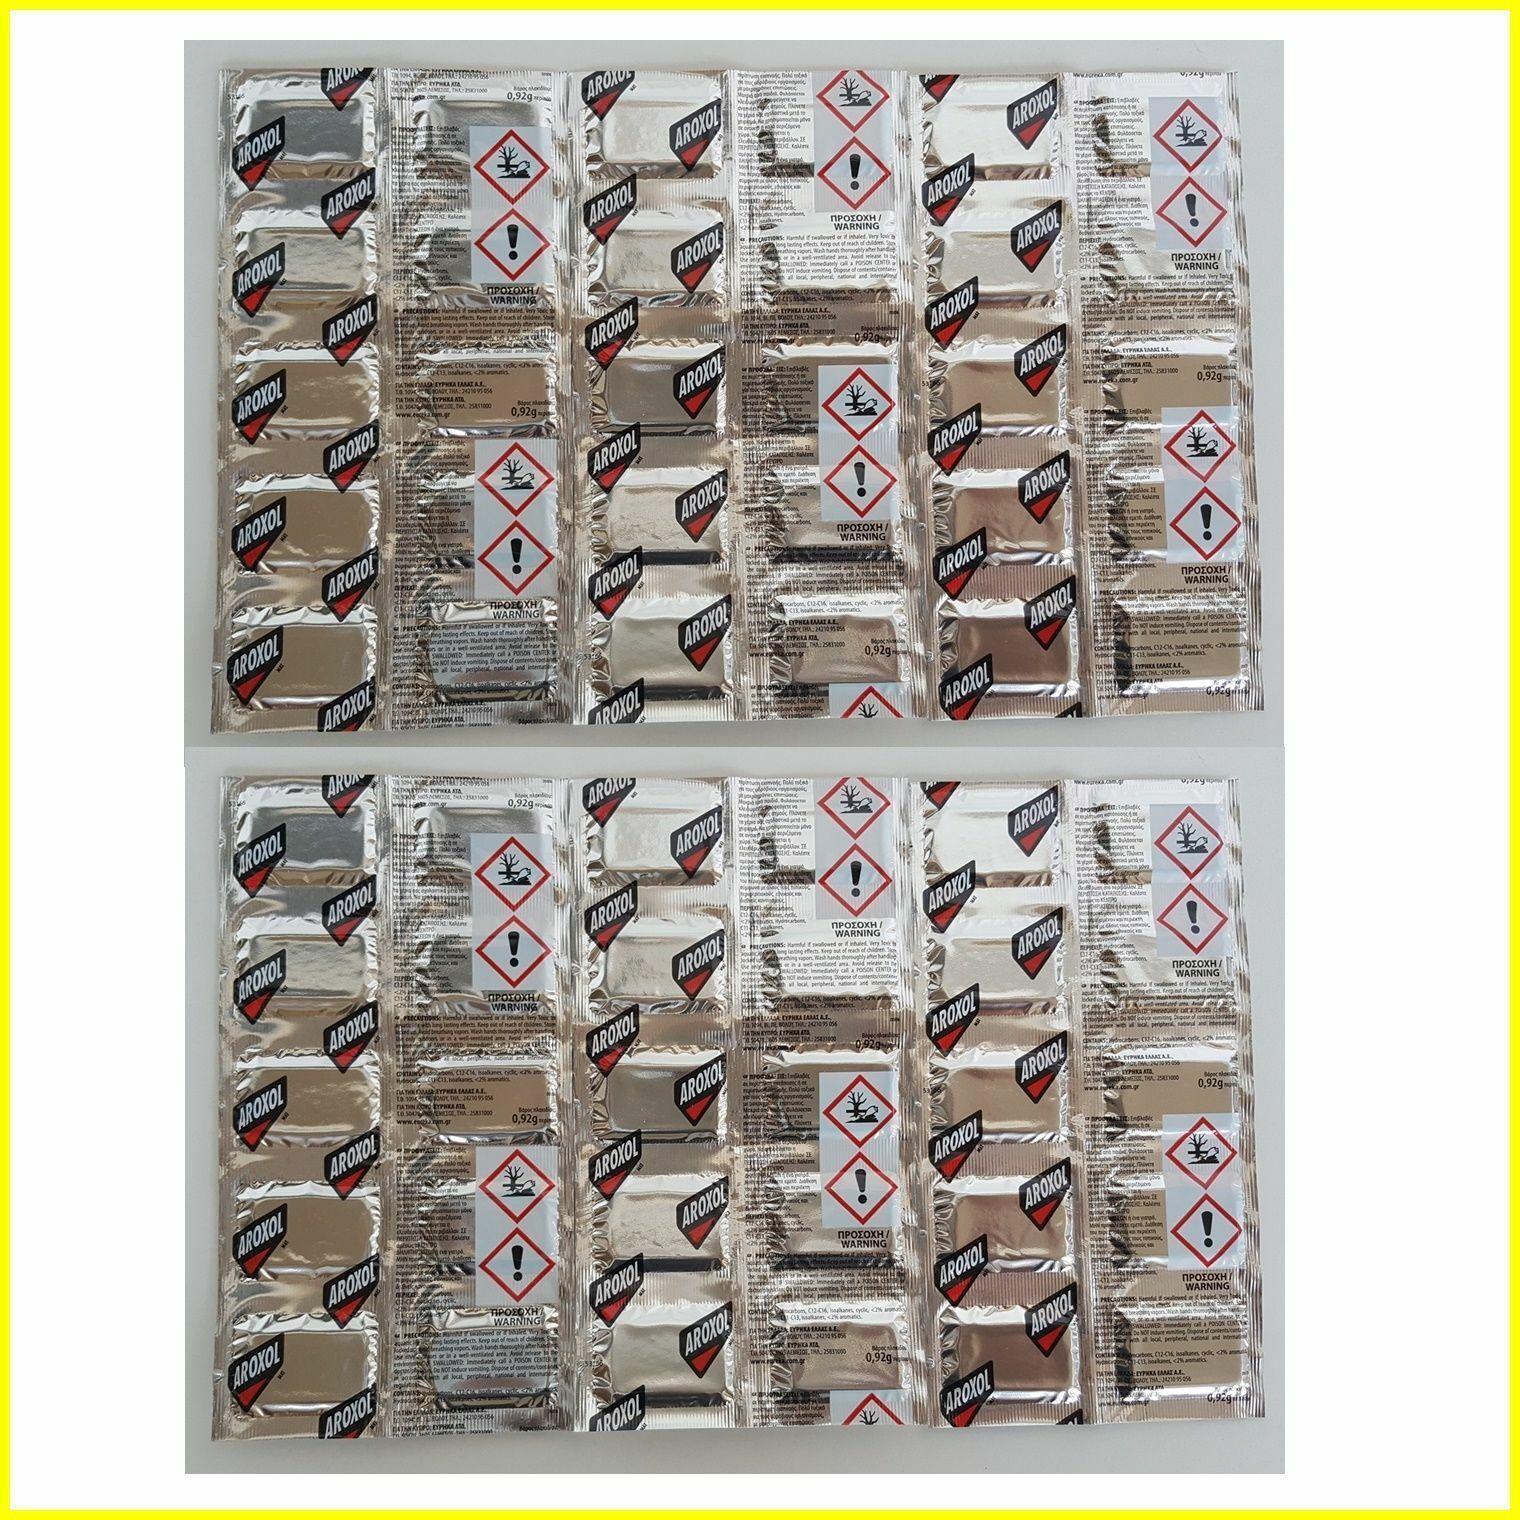 Mosquito (Tiger) Insectes Mouches Piqûres Moustiques aroxol Tapis Tablettes Recharges 540pcs